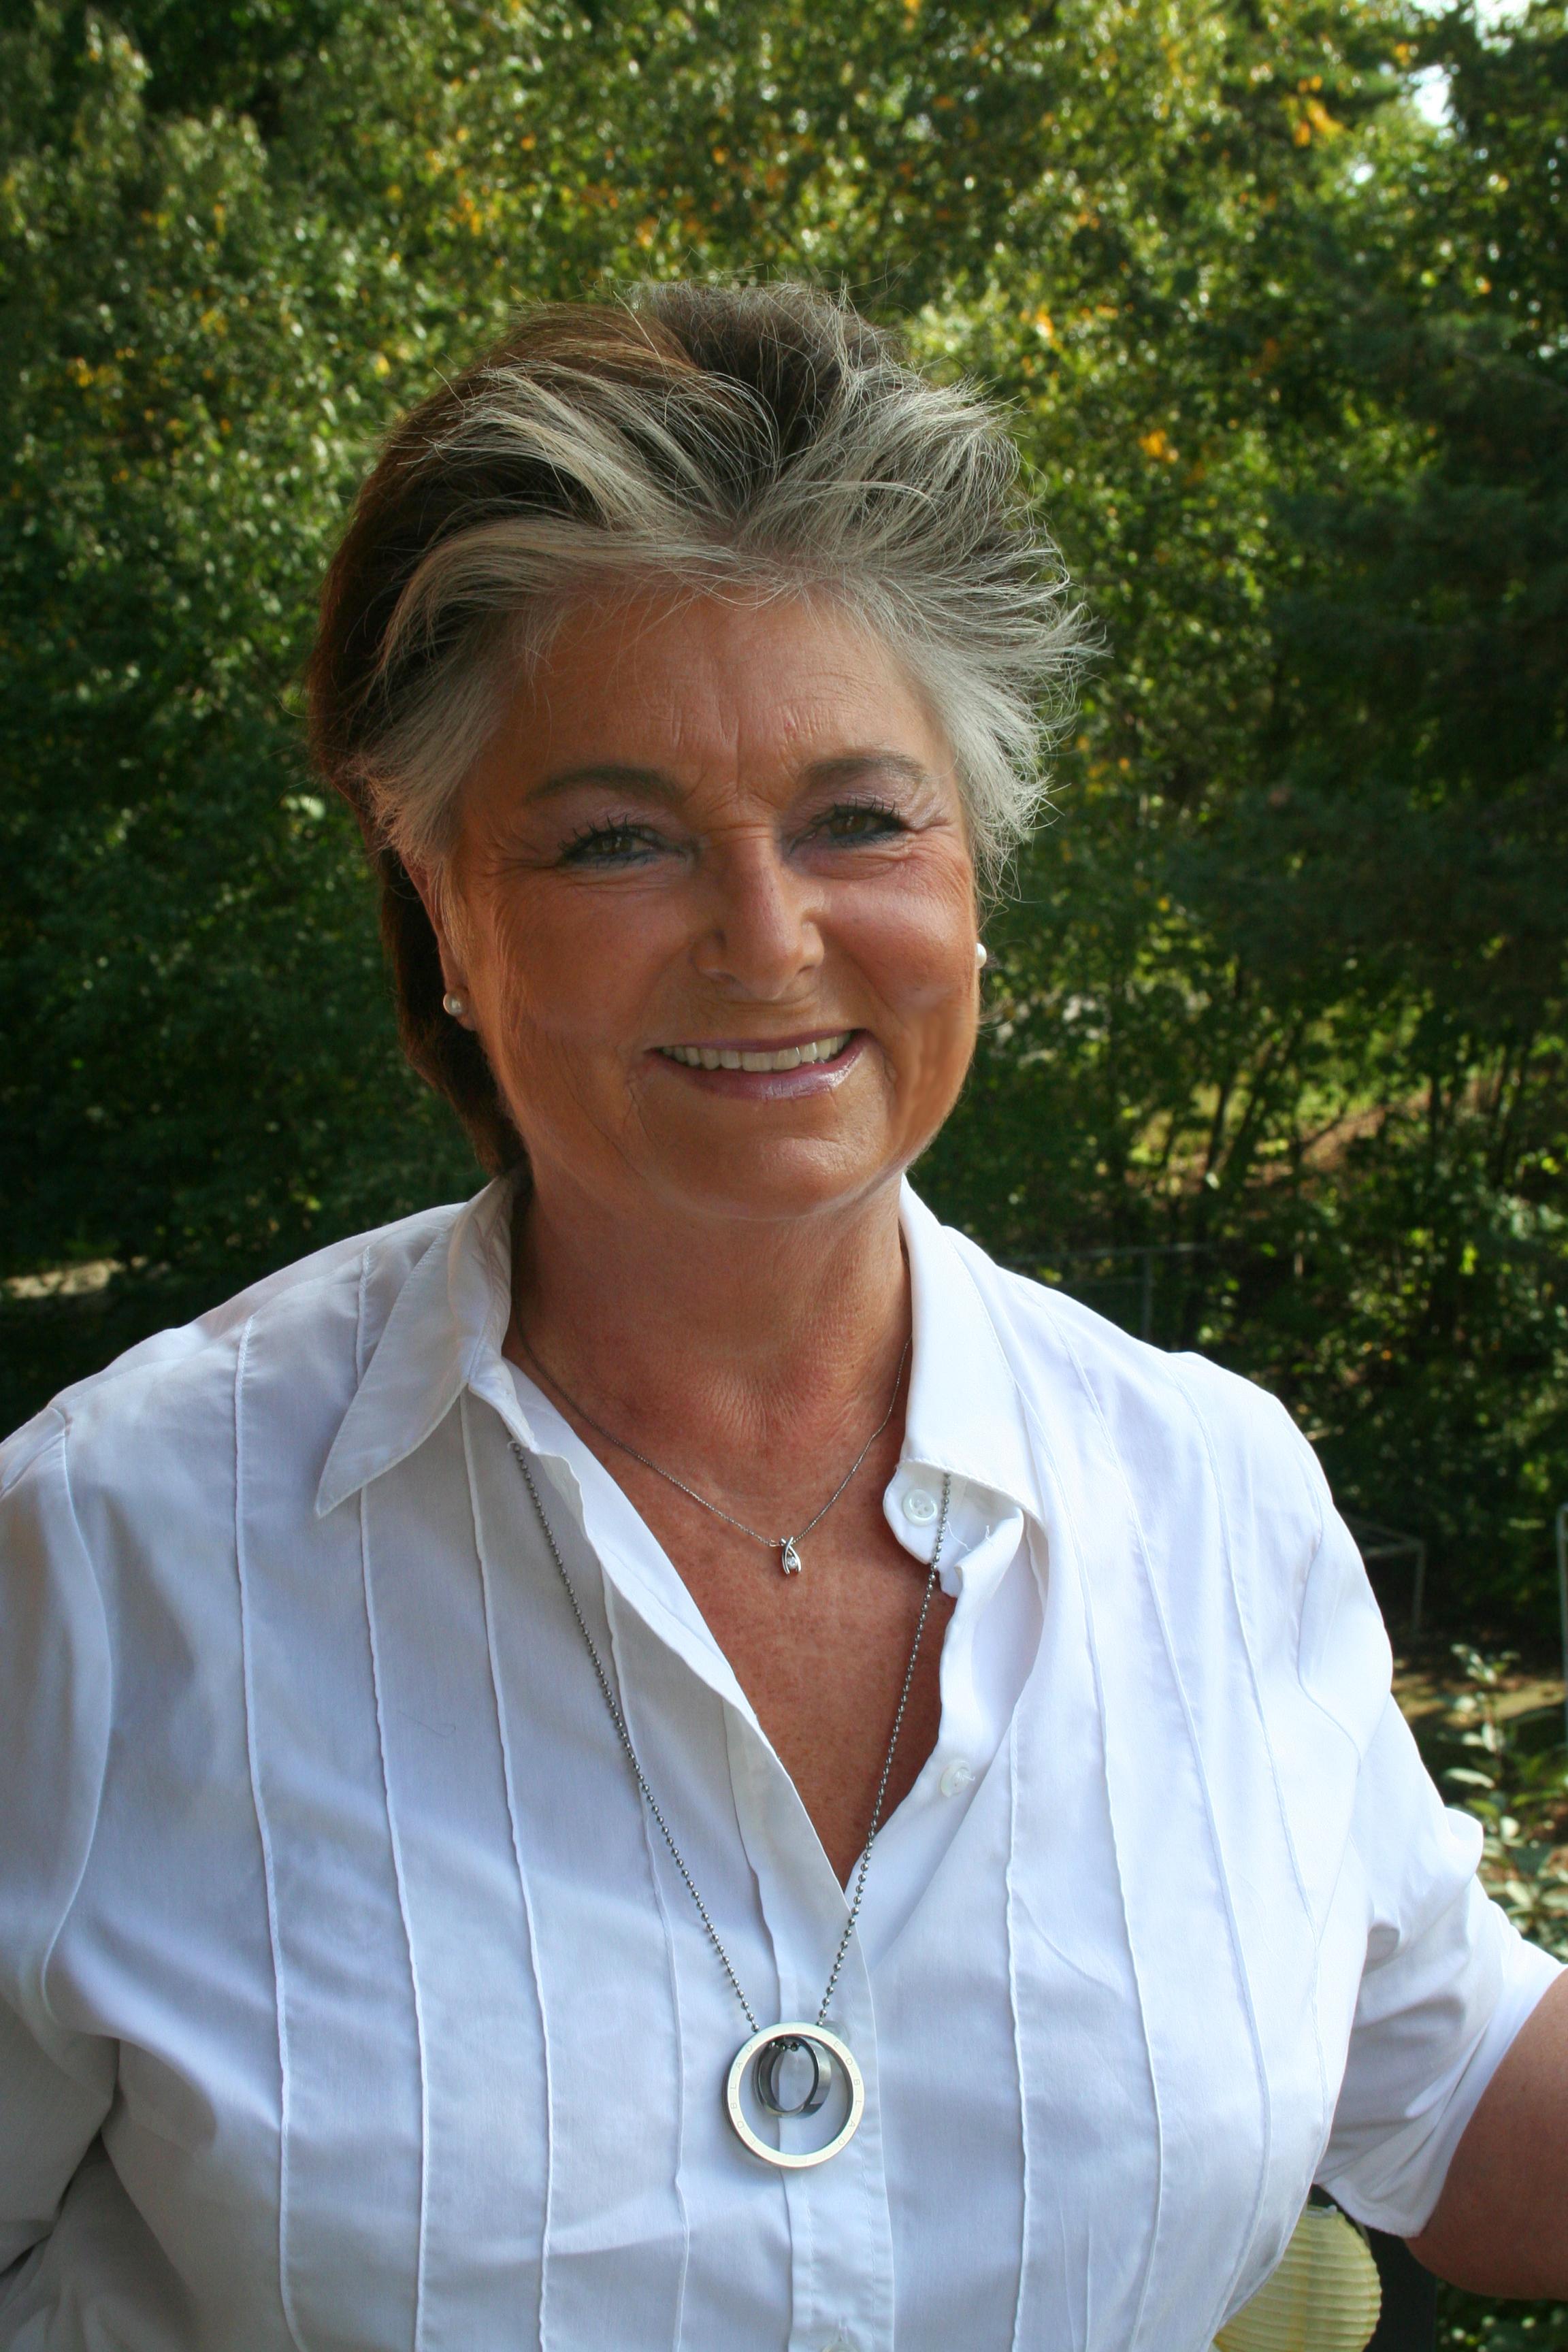 Marika Ronthy